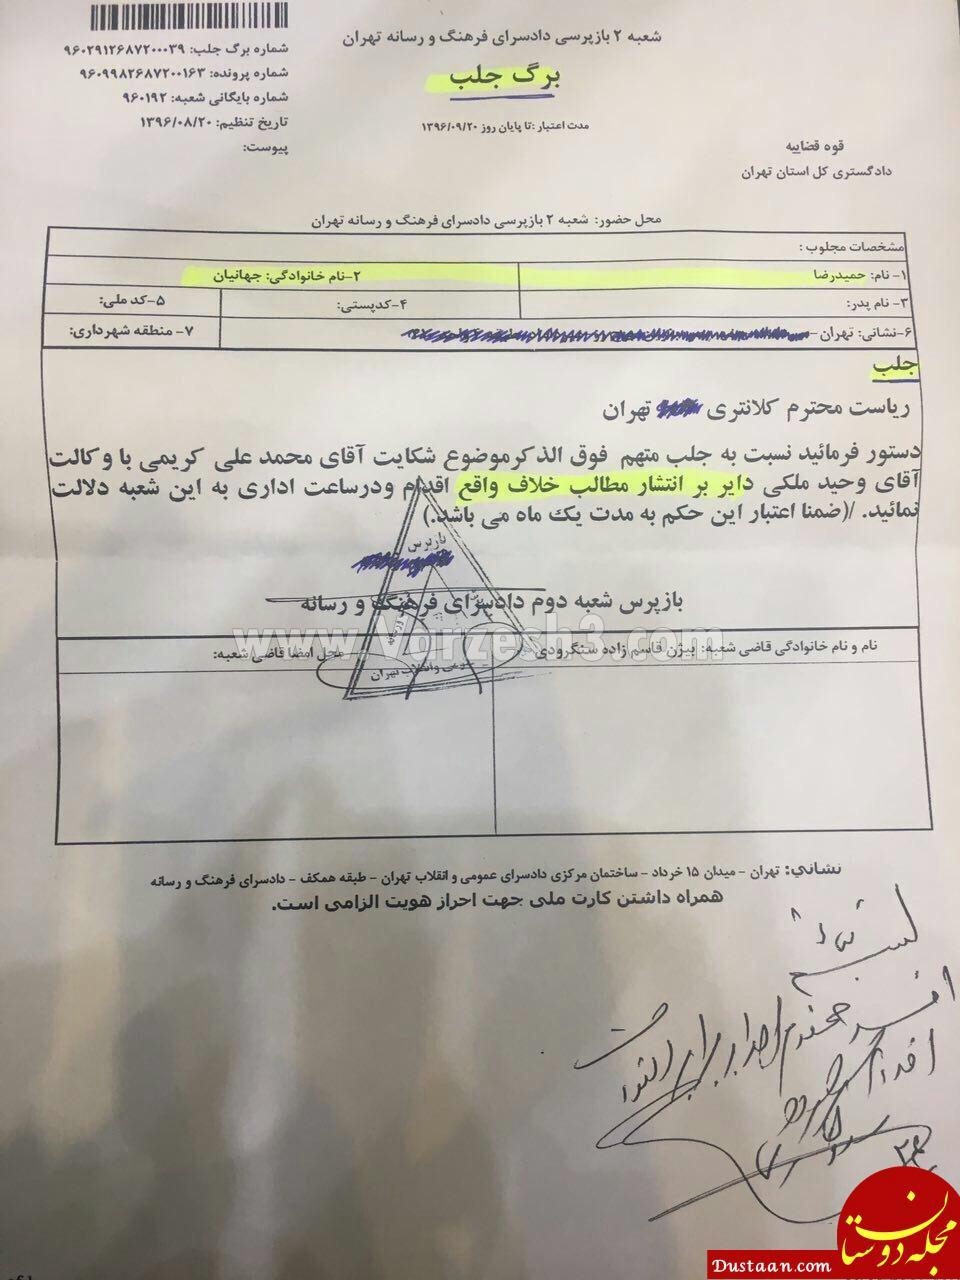 www.dustaan.com علی کریمی حکم جلب حمیدرضا جهانیان را گرفت +عکس